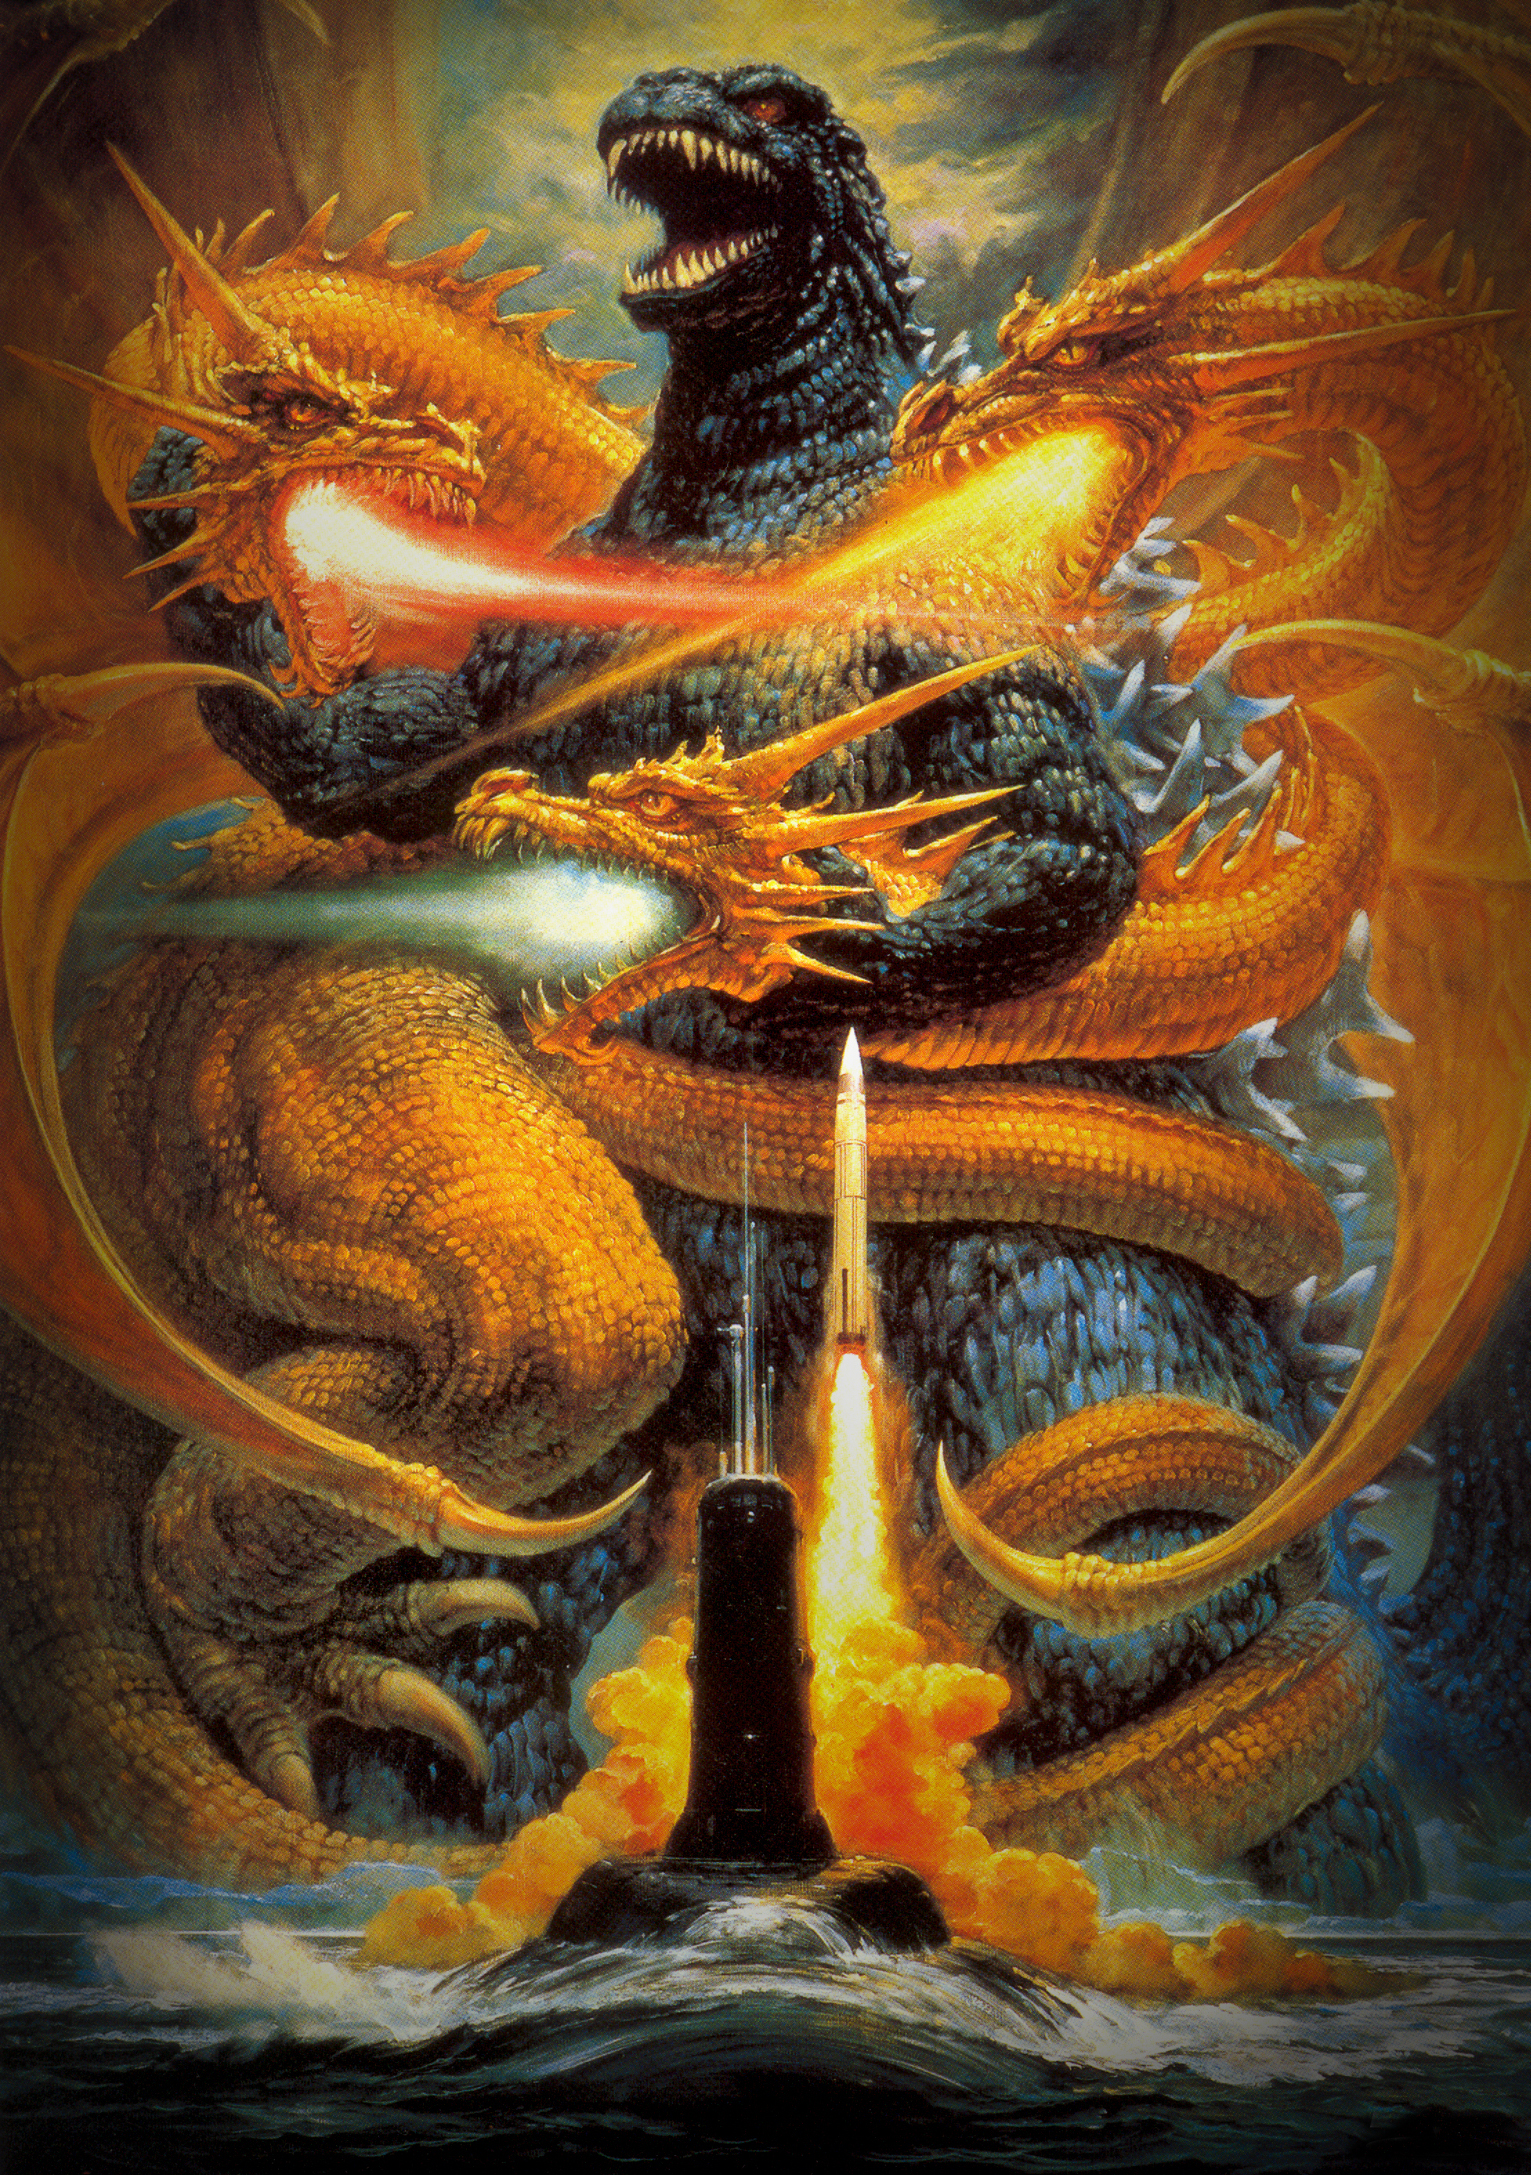 Godzilla vs King Ghidorah (Toho, 1991) | Flickr - Photo Sharing!